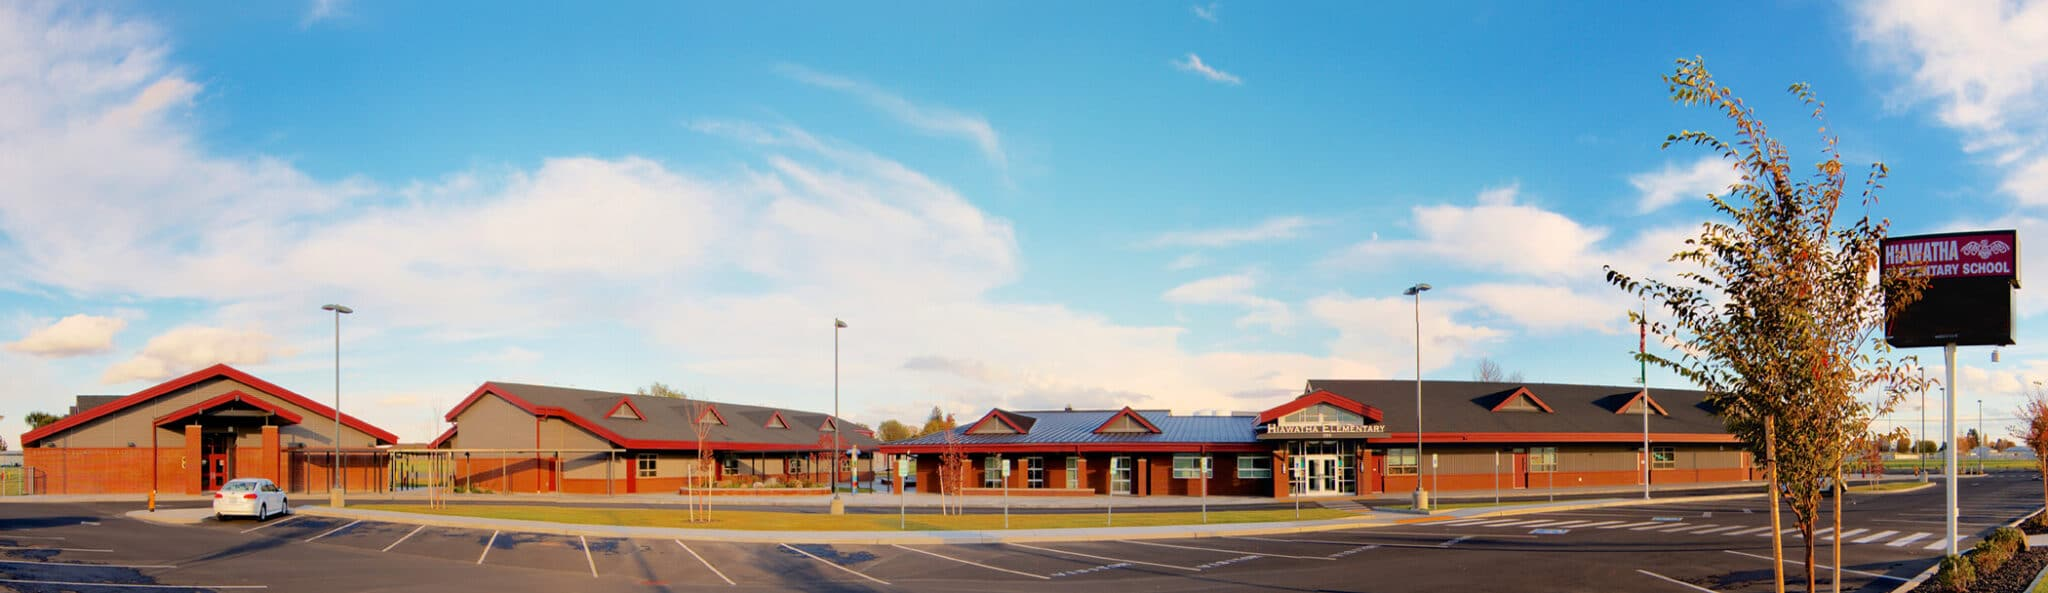 Hiawatha Elementary